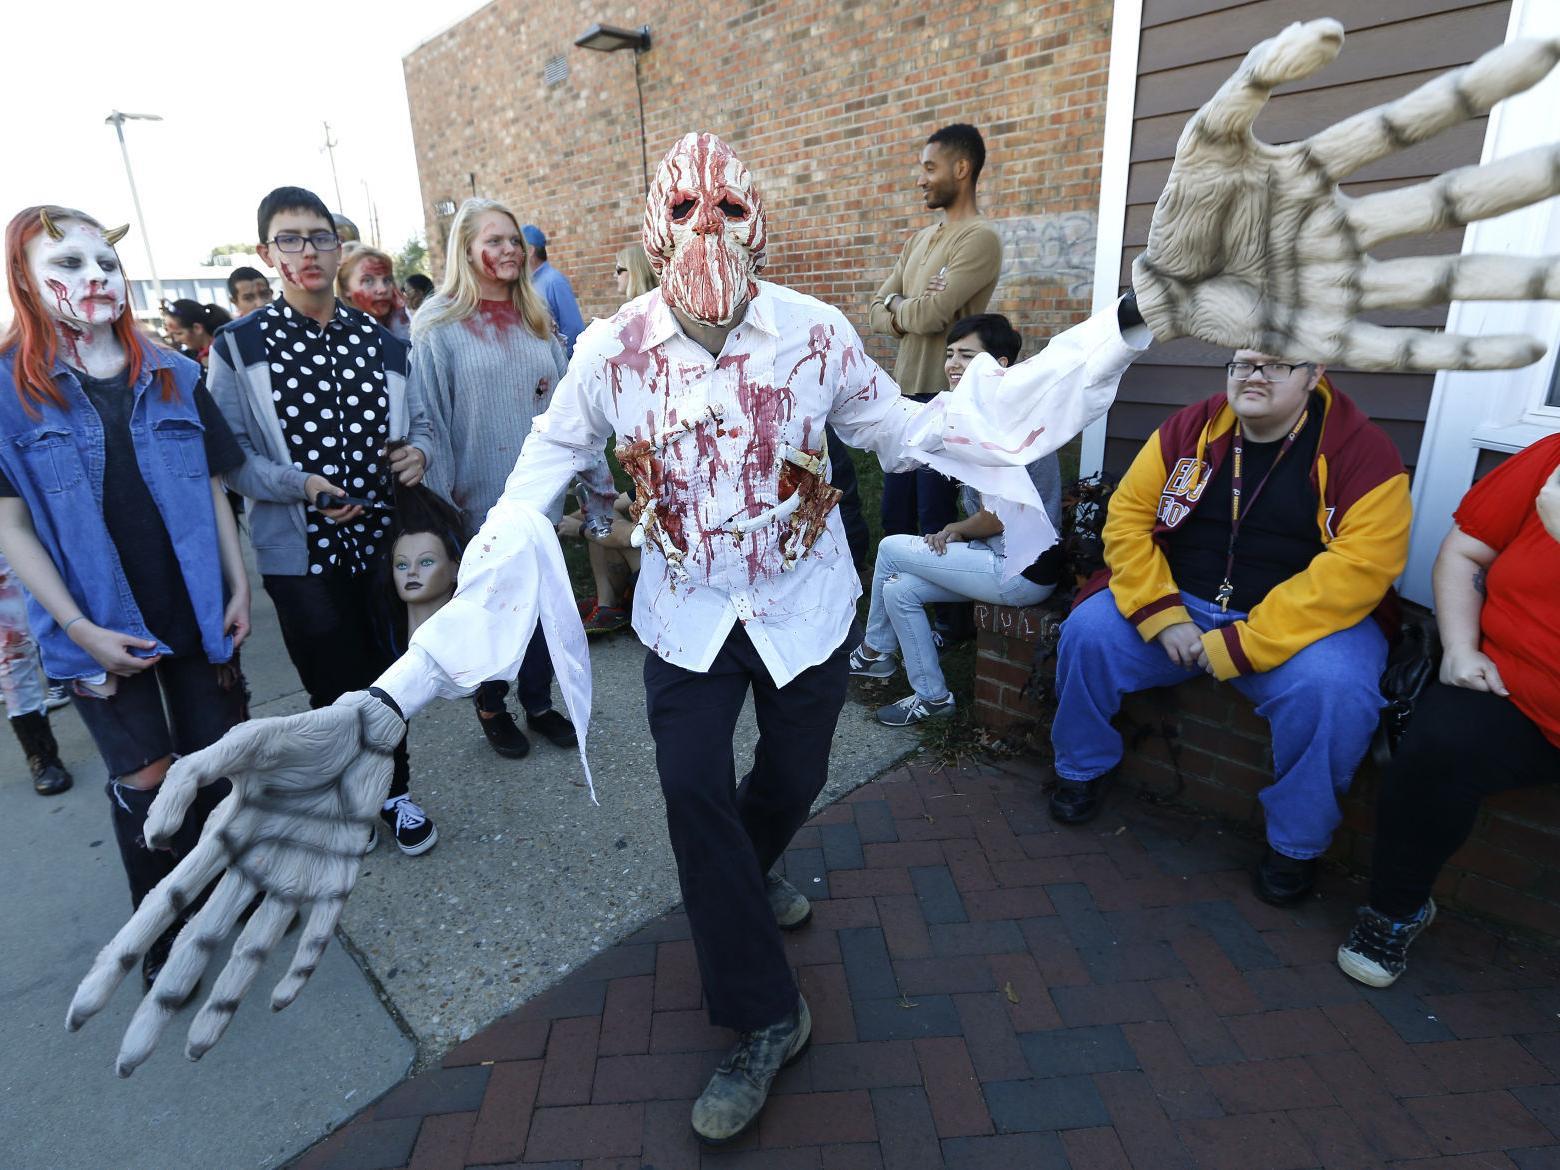 Poe Museum Halloween Events 2020 Richmond Va Halloween events fill the Richmond area calendar for Oct. 22 28